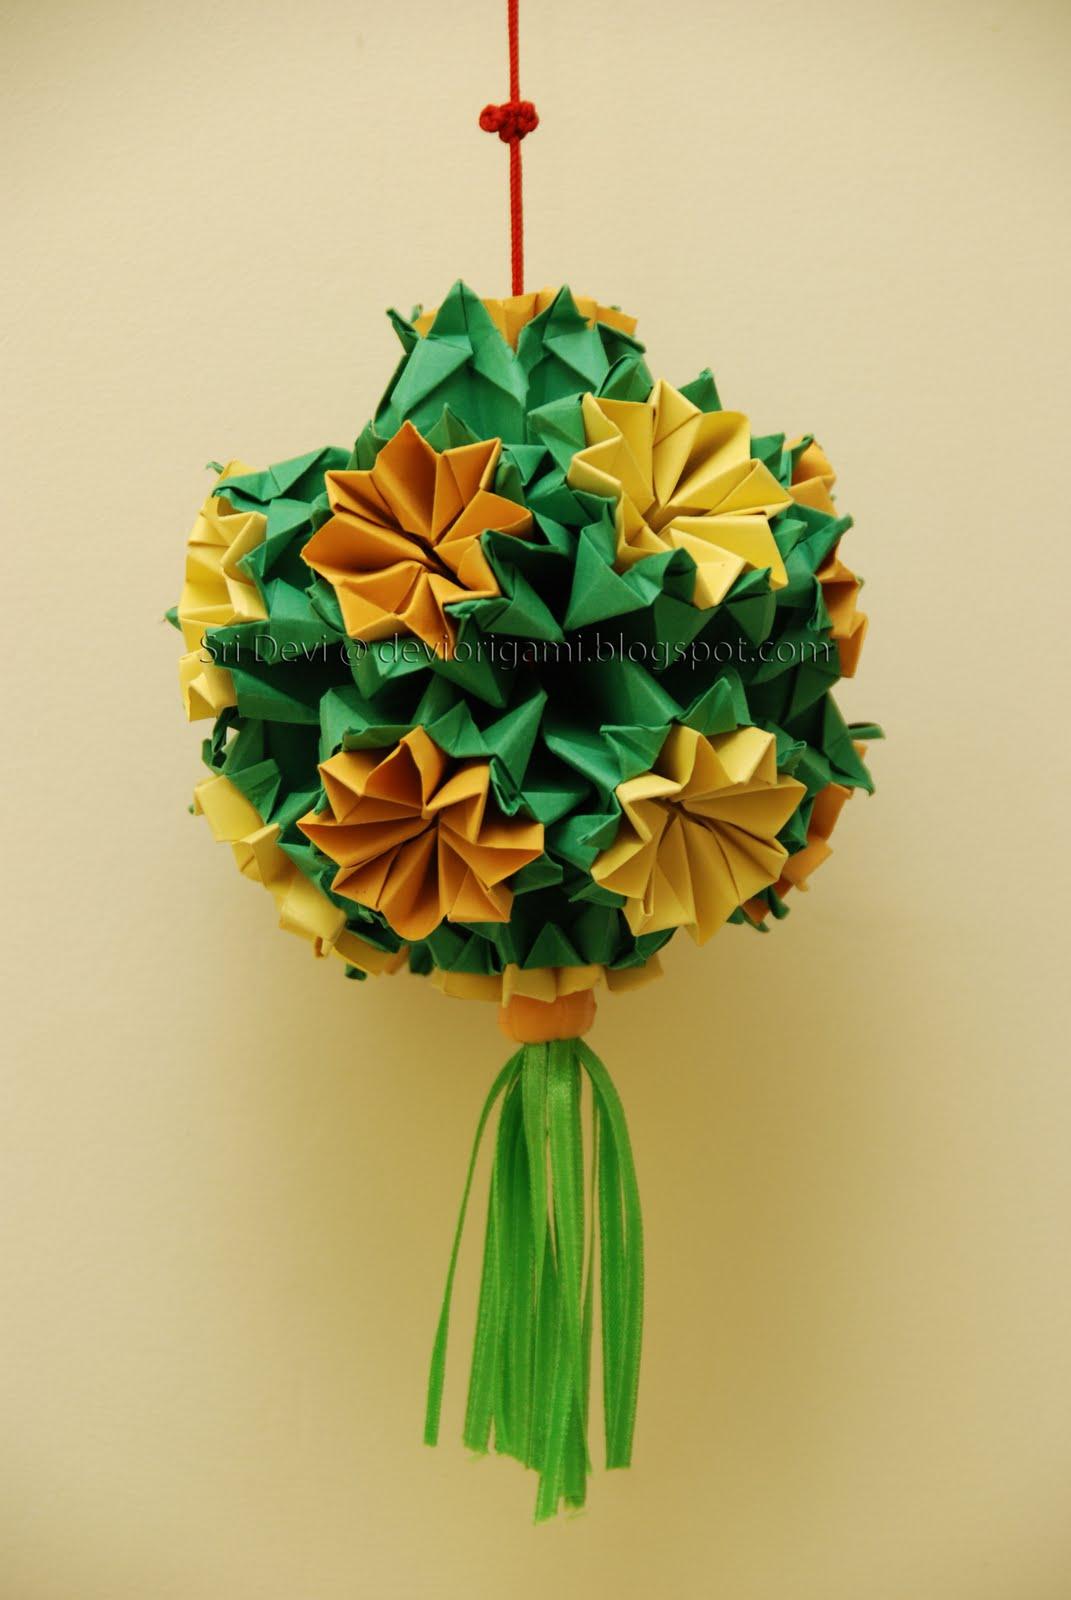 Busy Hands & Nimble Fingers: kusudama -- Bouquet of Primula - photo#9